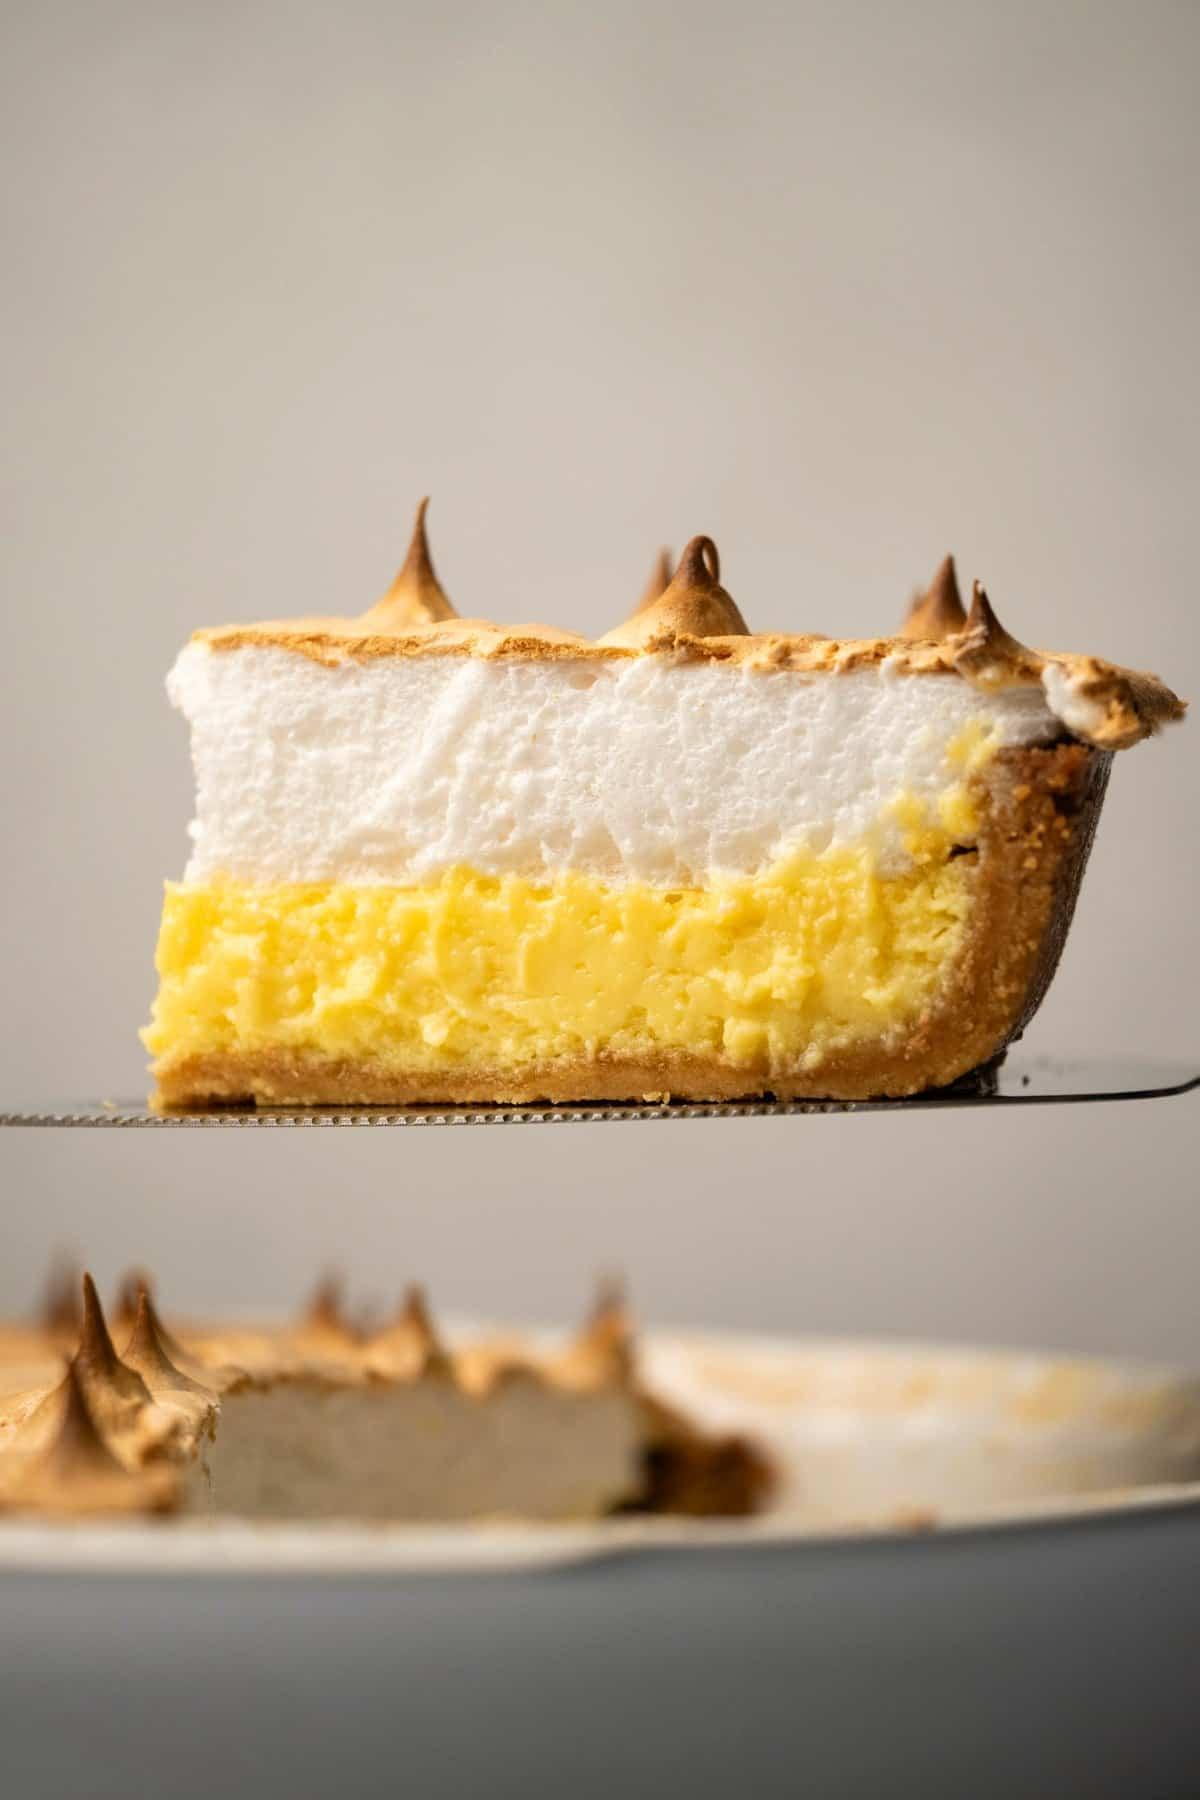 Slice of lemon meringue pie on a cake lifter.